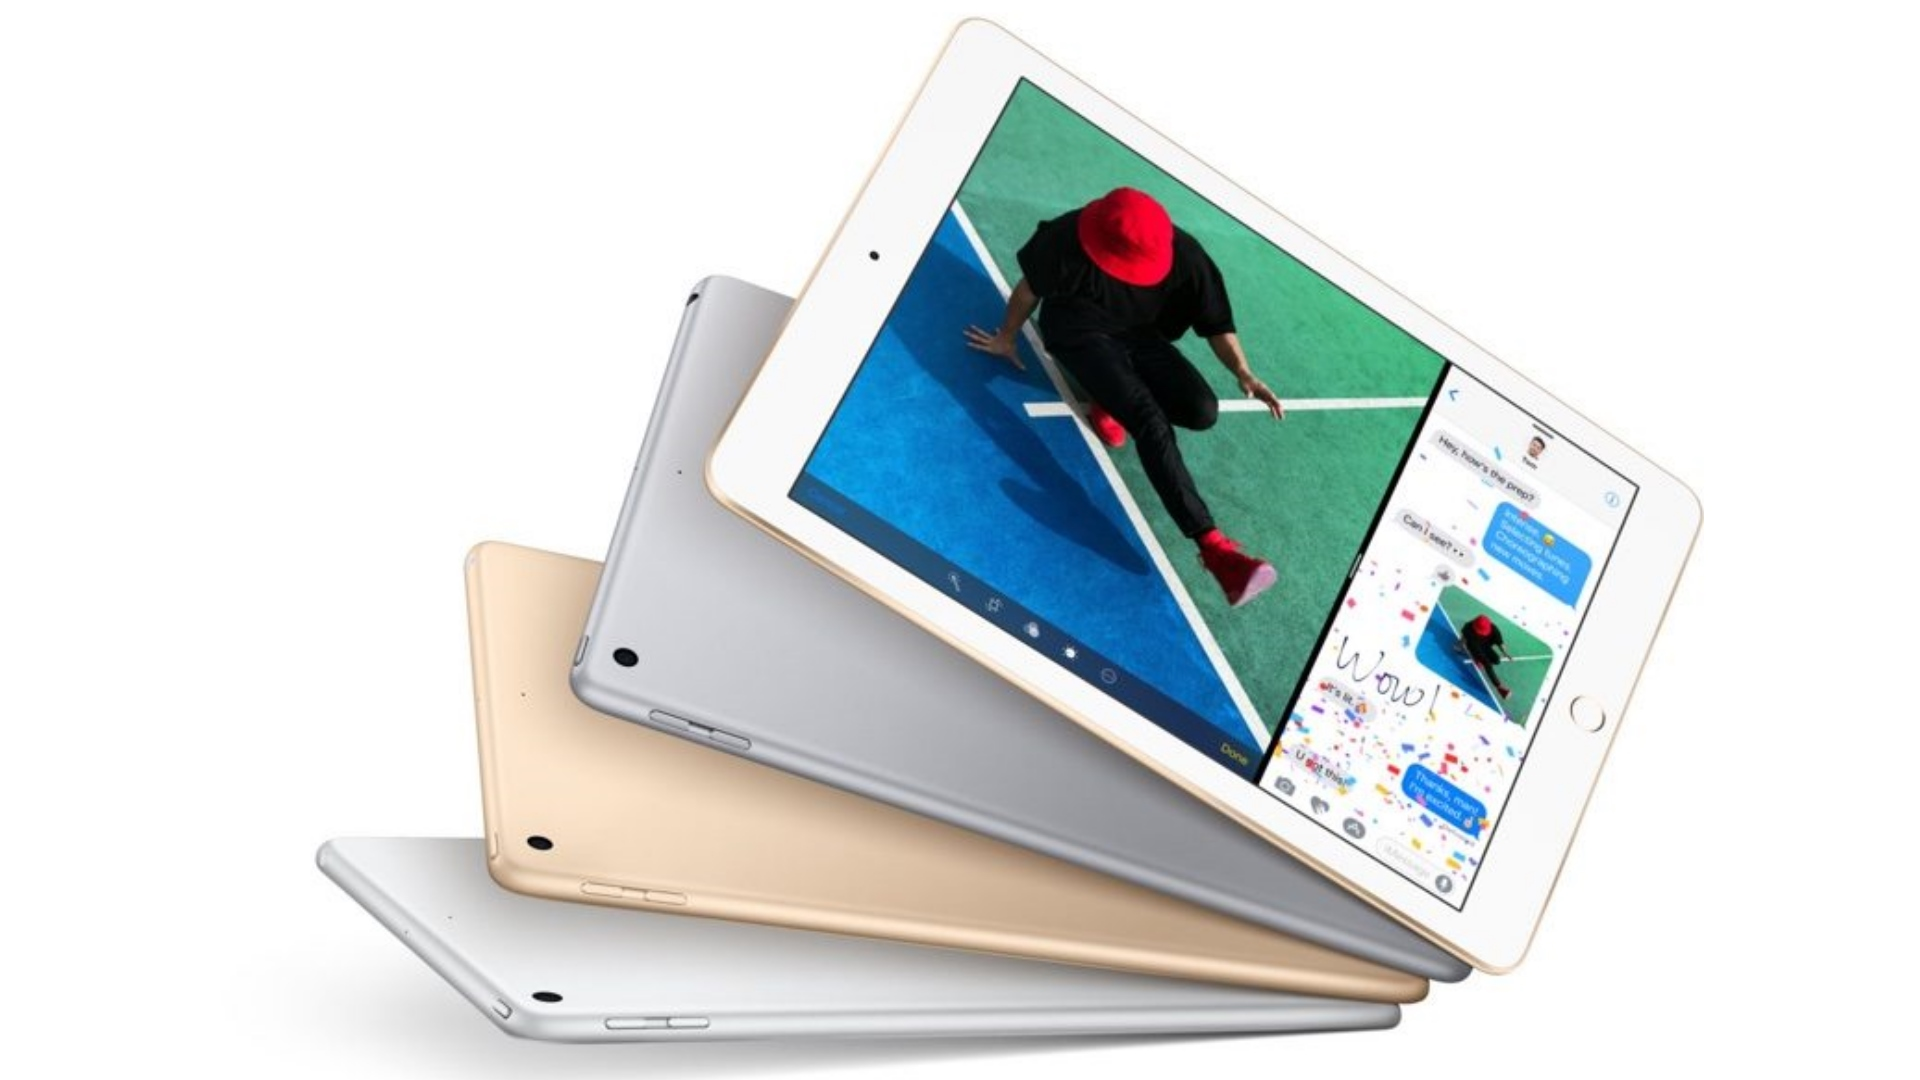 ipad prices 9.7-inch model